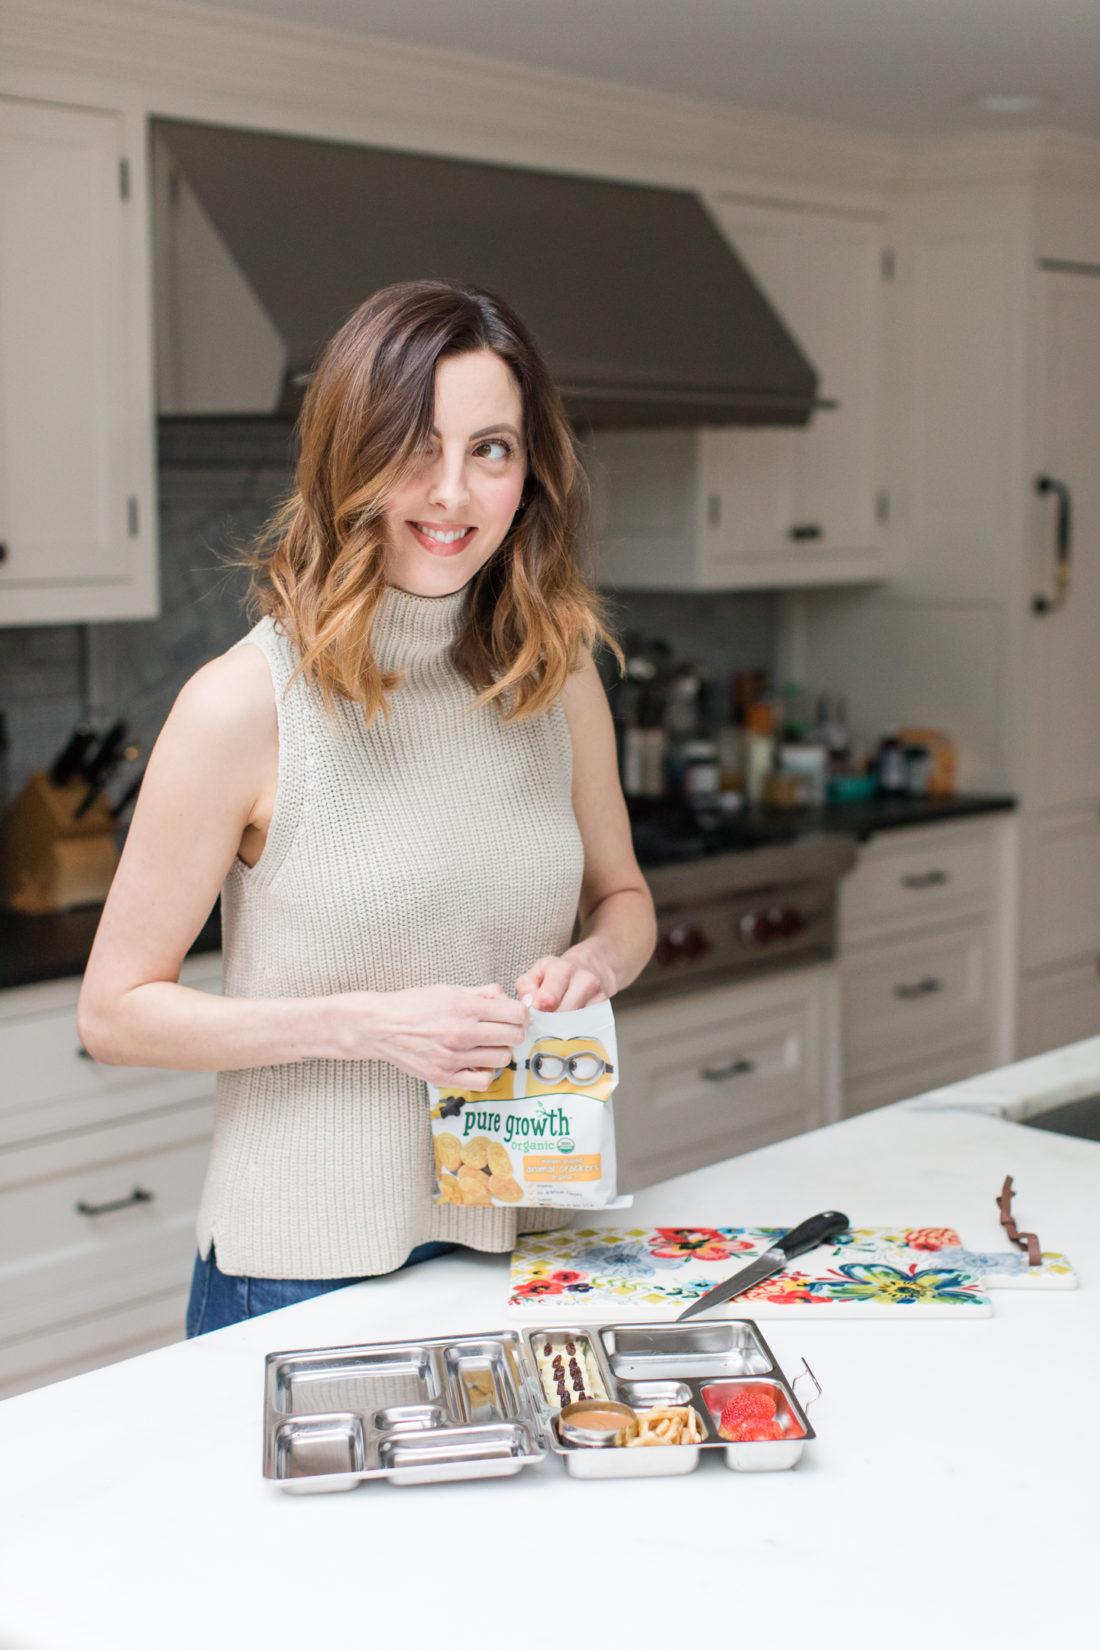 Eva Amurri Martino packs a Minion themed lunch her her daughter Marlowe